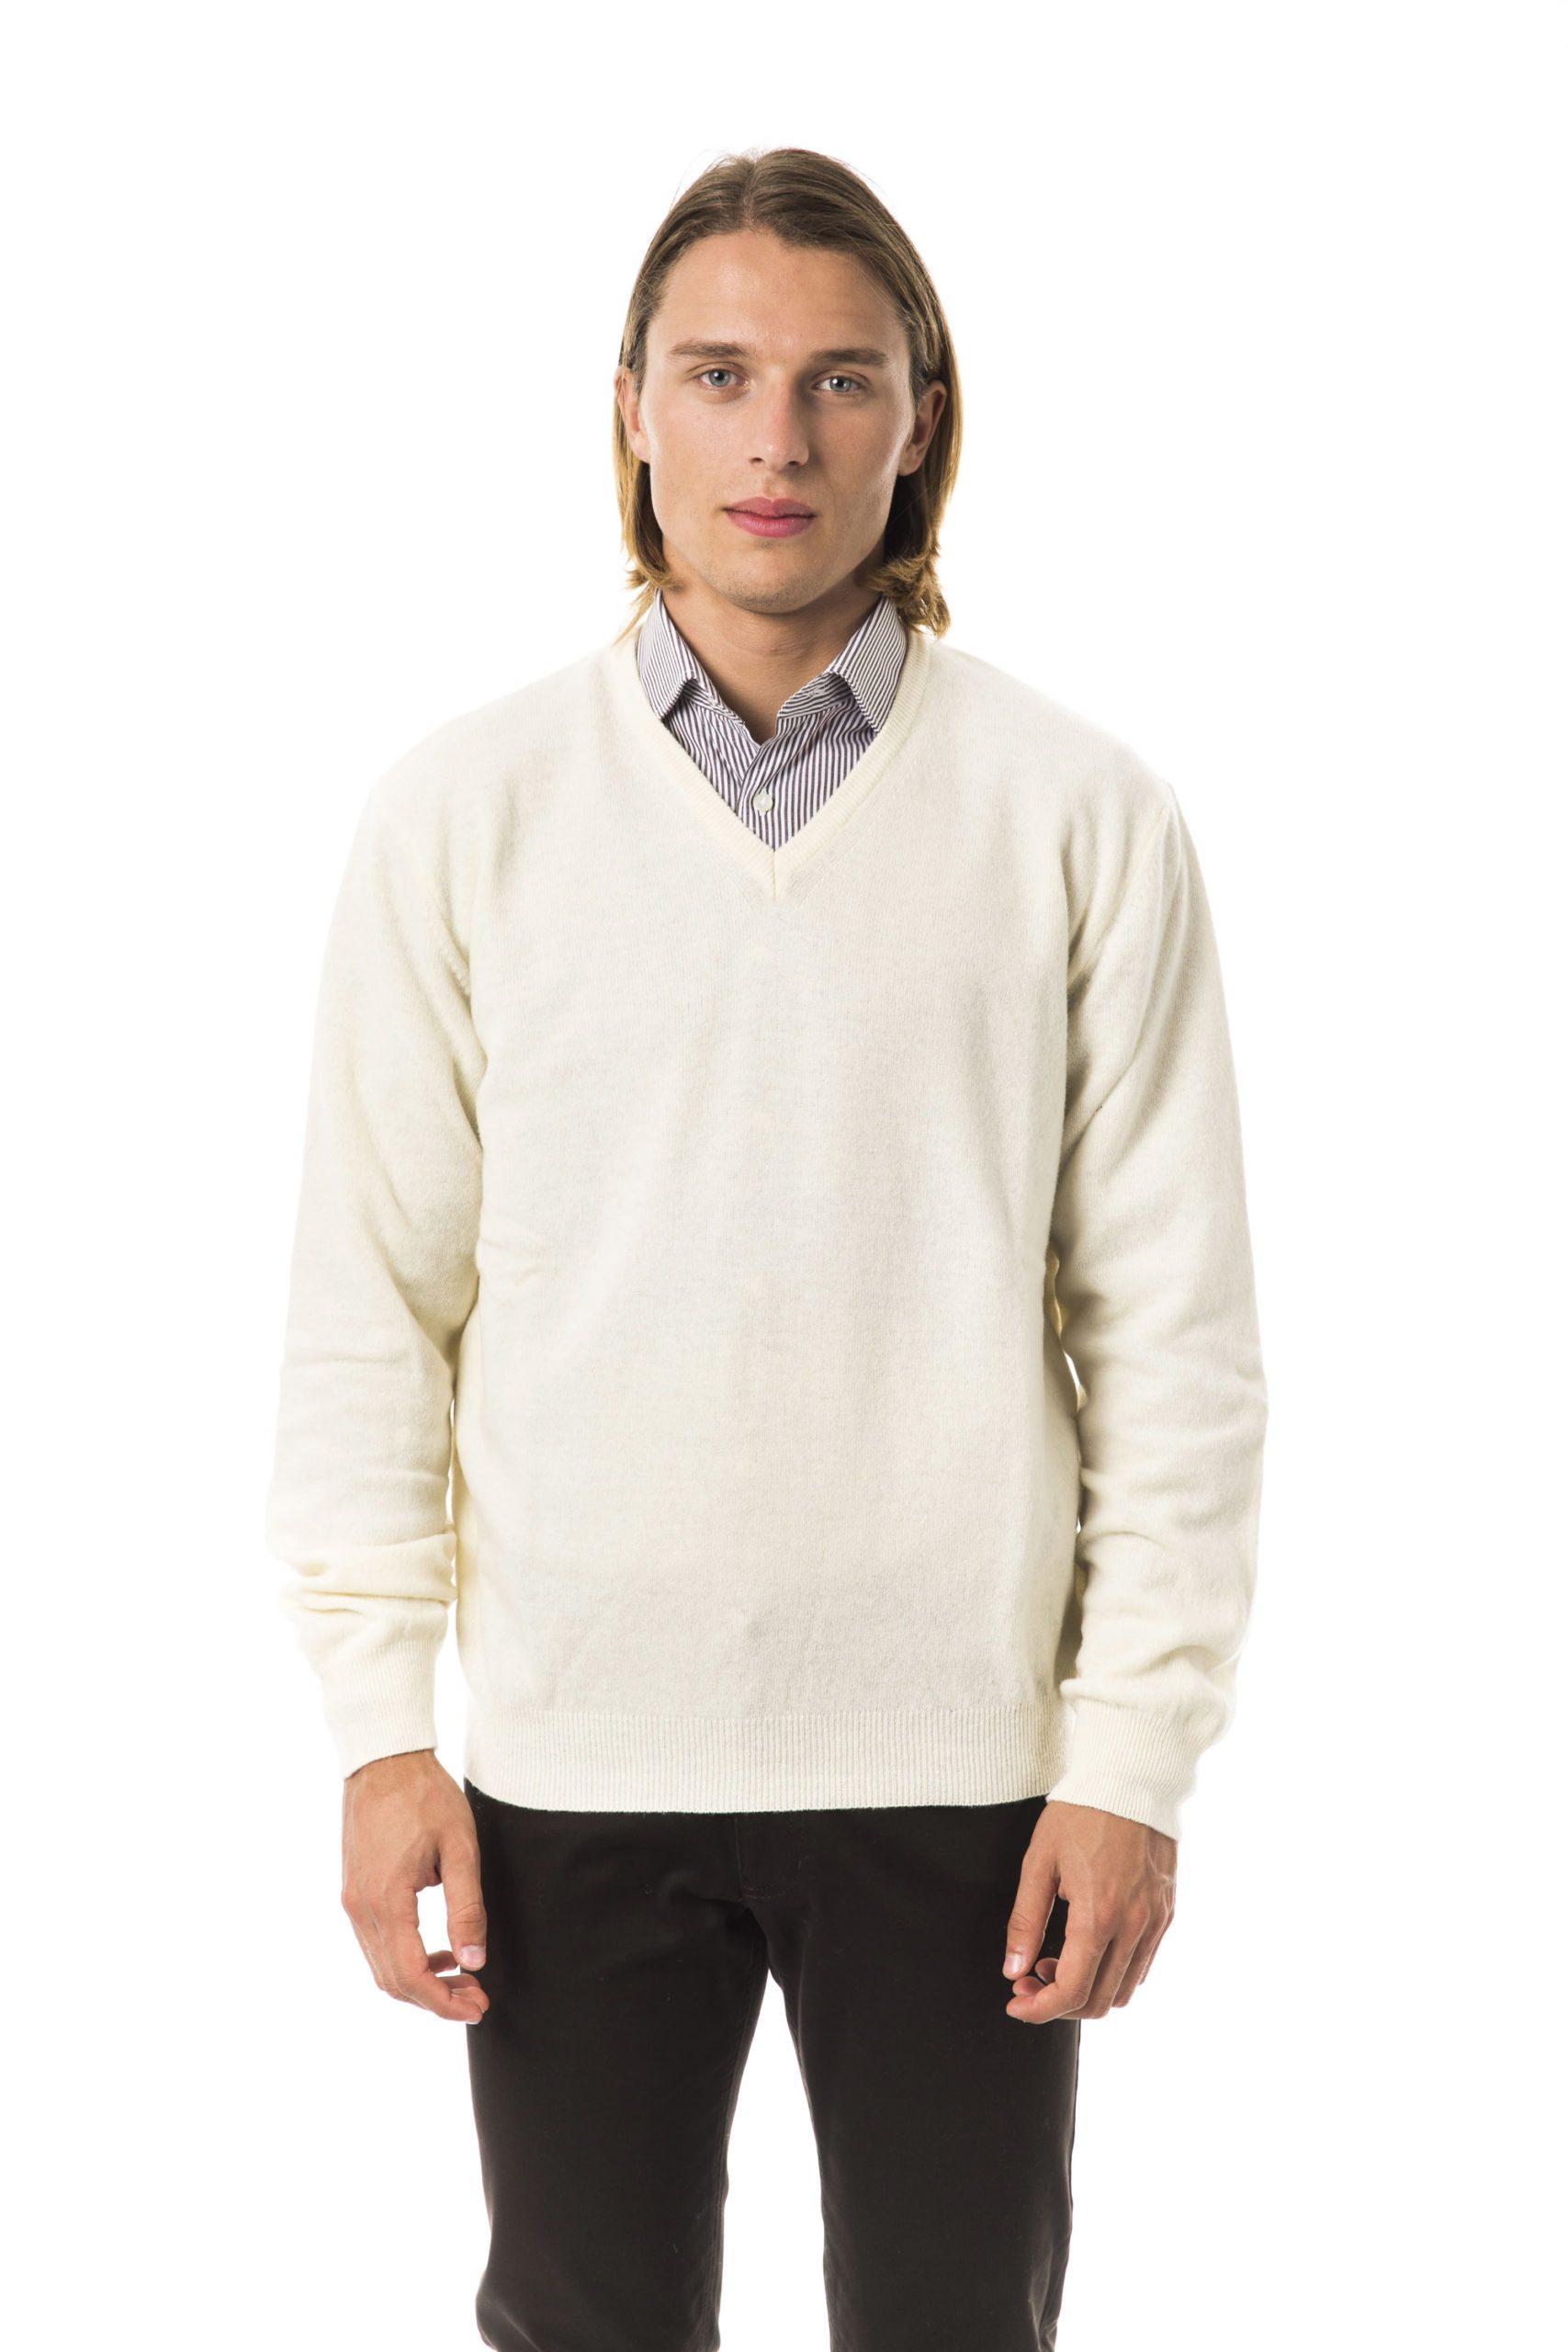 BYBLOS Men's Panna Sweater White BY817126 - L